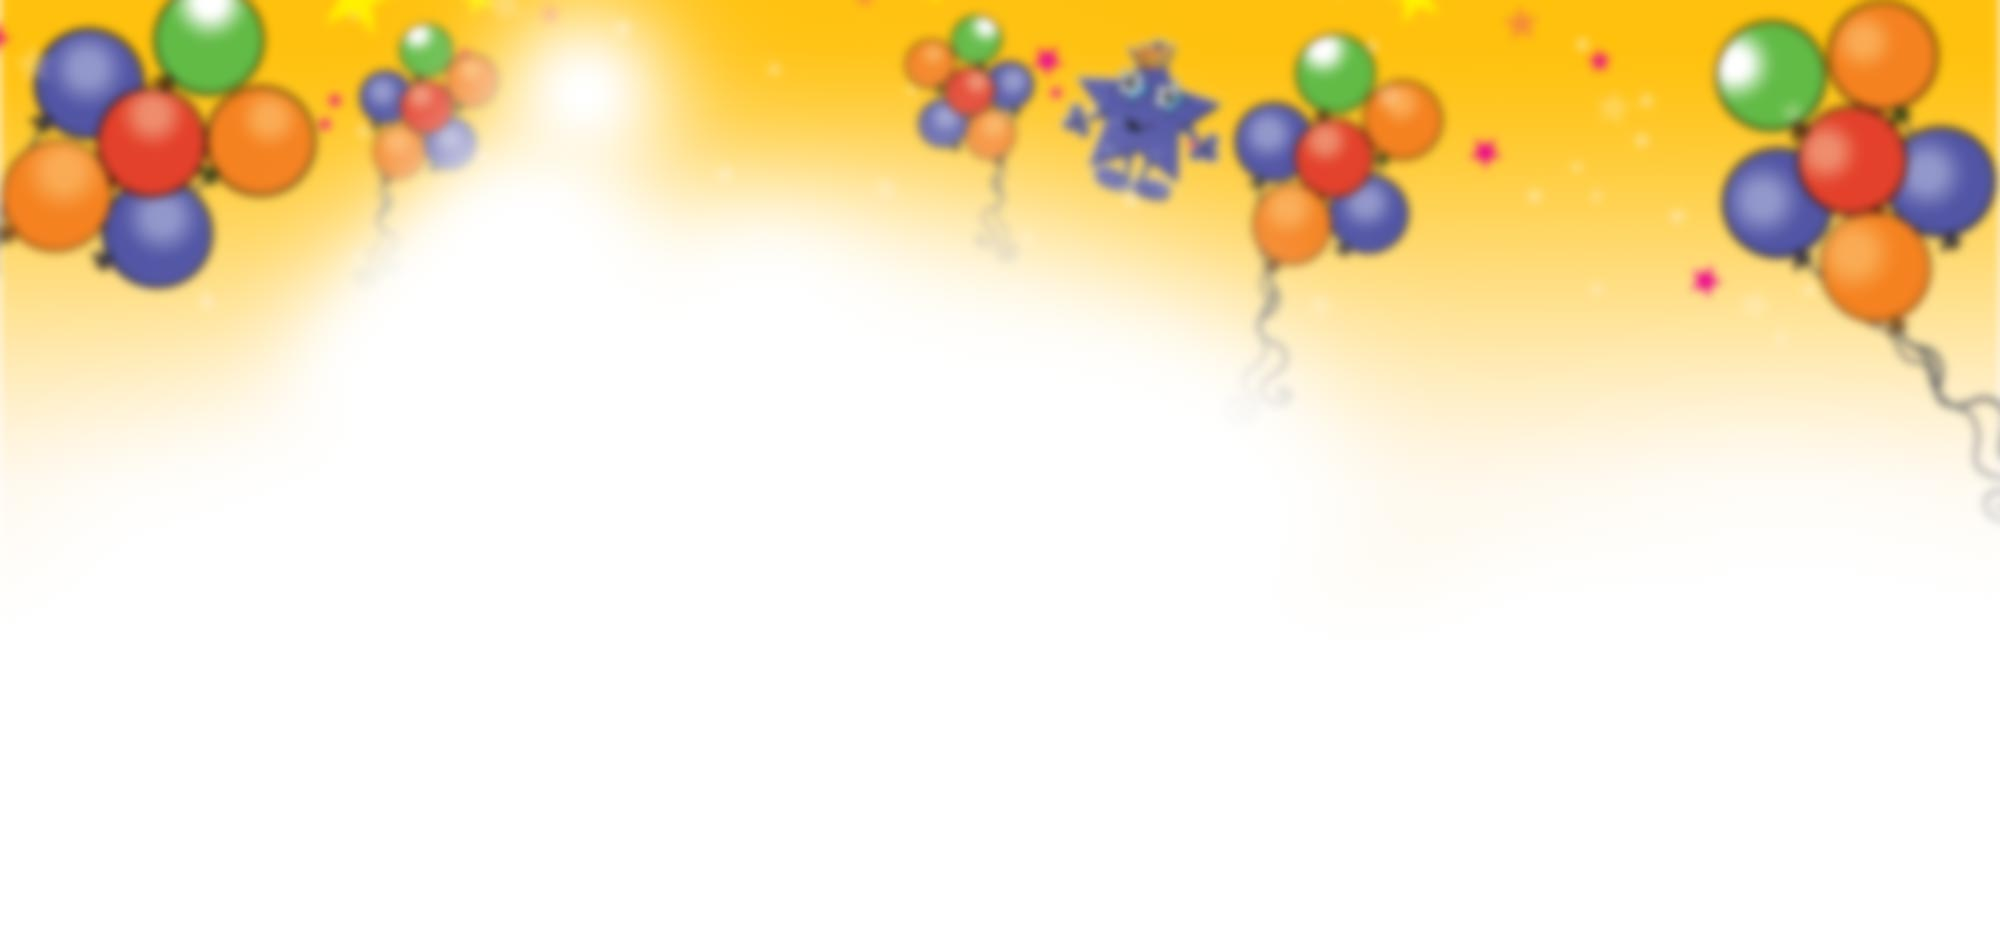 Birthday Celebration Wallpaper - WallpaperSafari